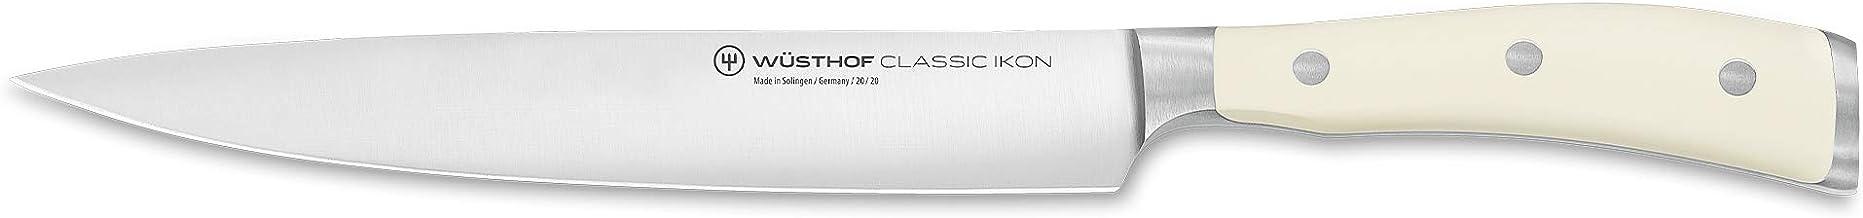 Wüsthof Schinkenmesser, Classic Ikon Crème (1040430720), 20 cm Klinge, geschmiedet, Edelstahl, rostfrei, Fleischmesser Ext...